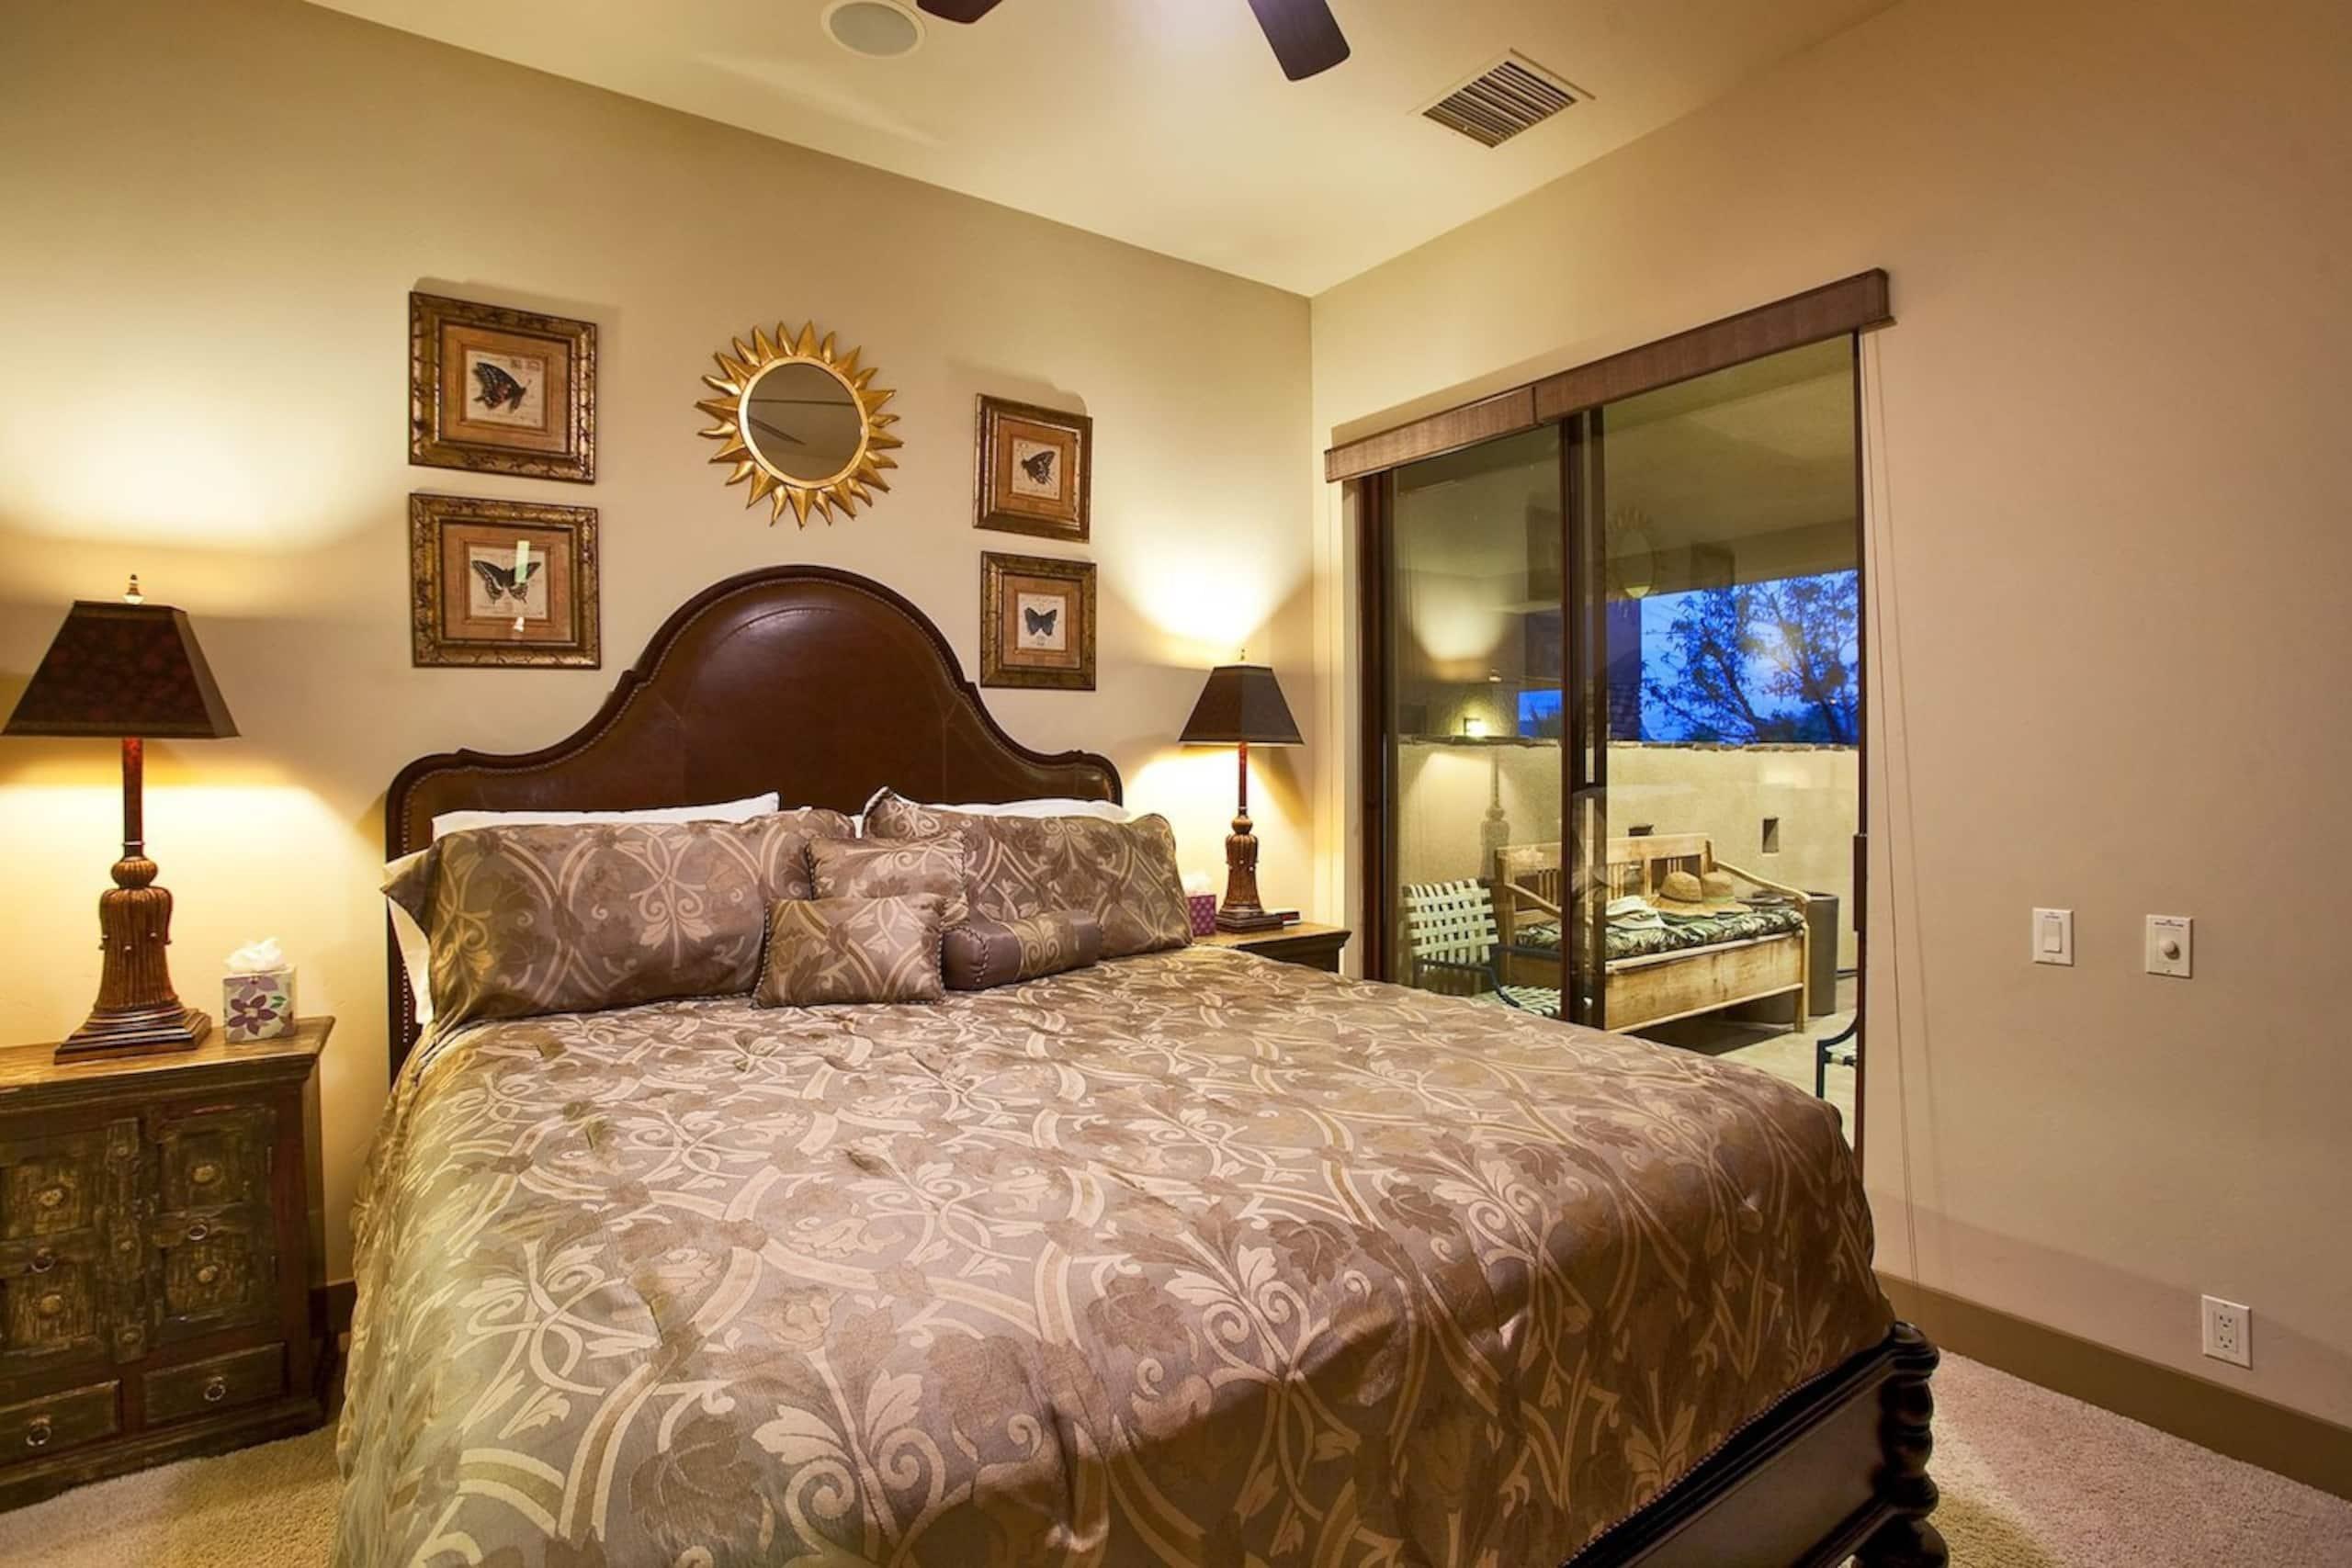 Apartment Villa Elmo - Marvelous 5 Bedrooms photo 20326141